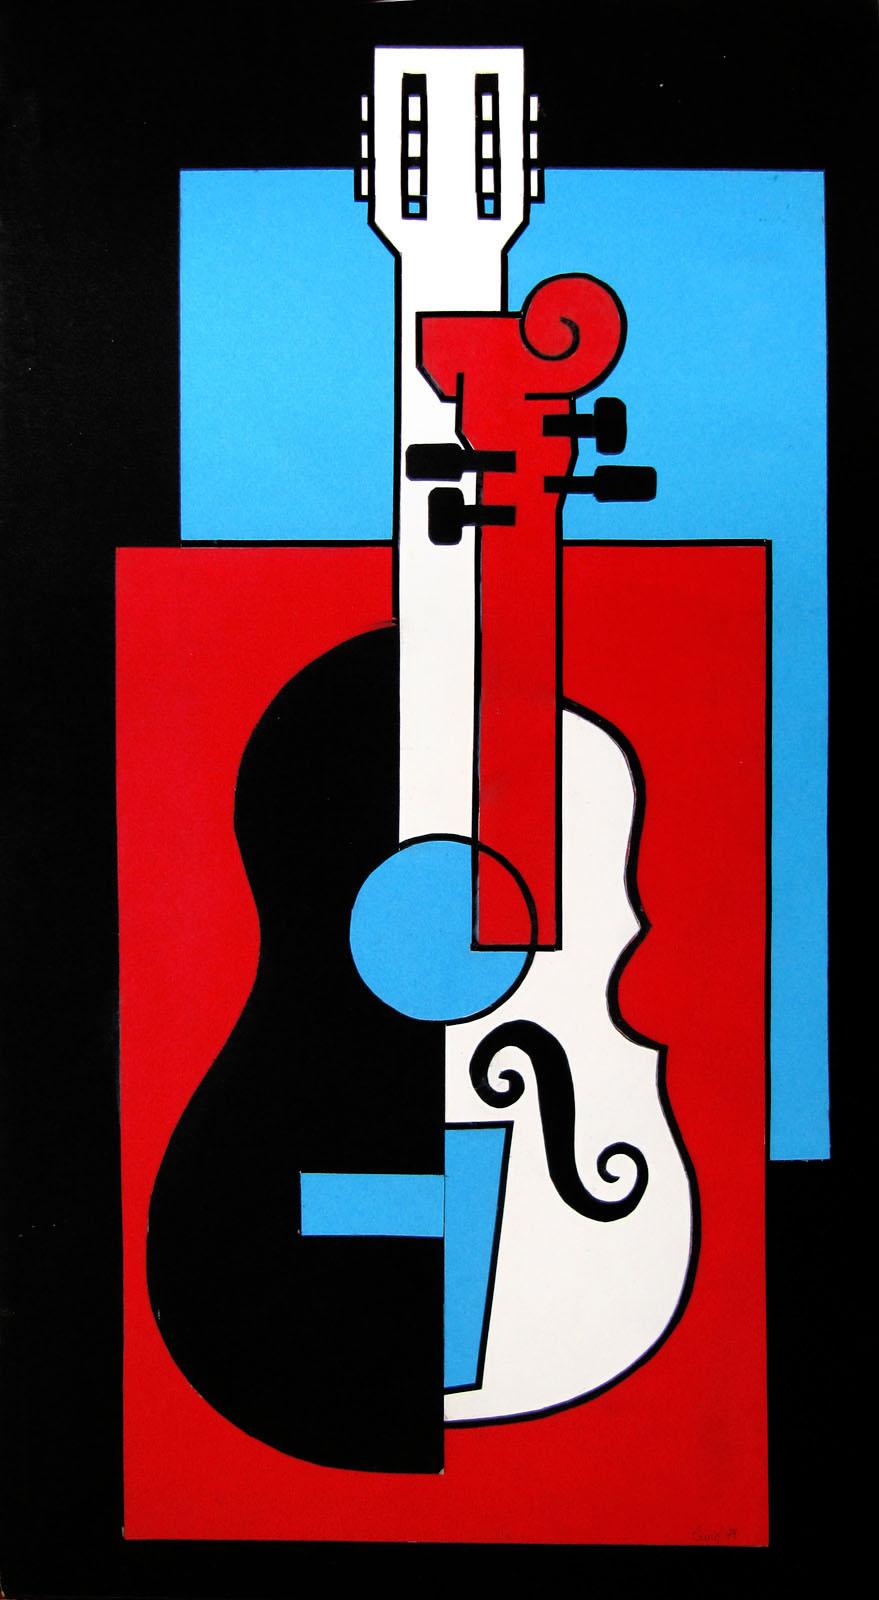 danielvillalobos-spanish-painting-twentiethcentury-cubism-2